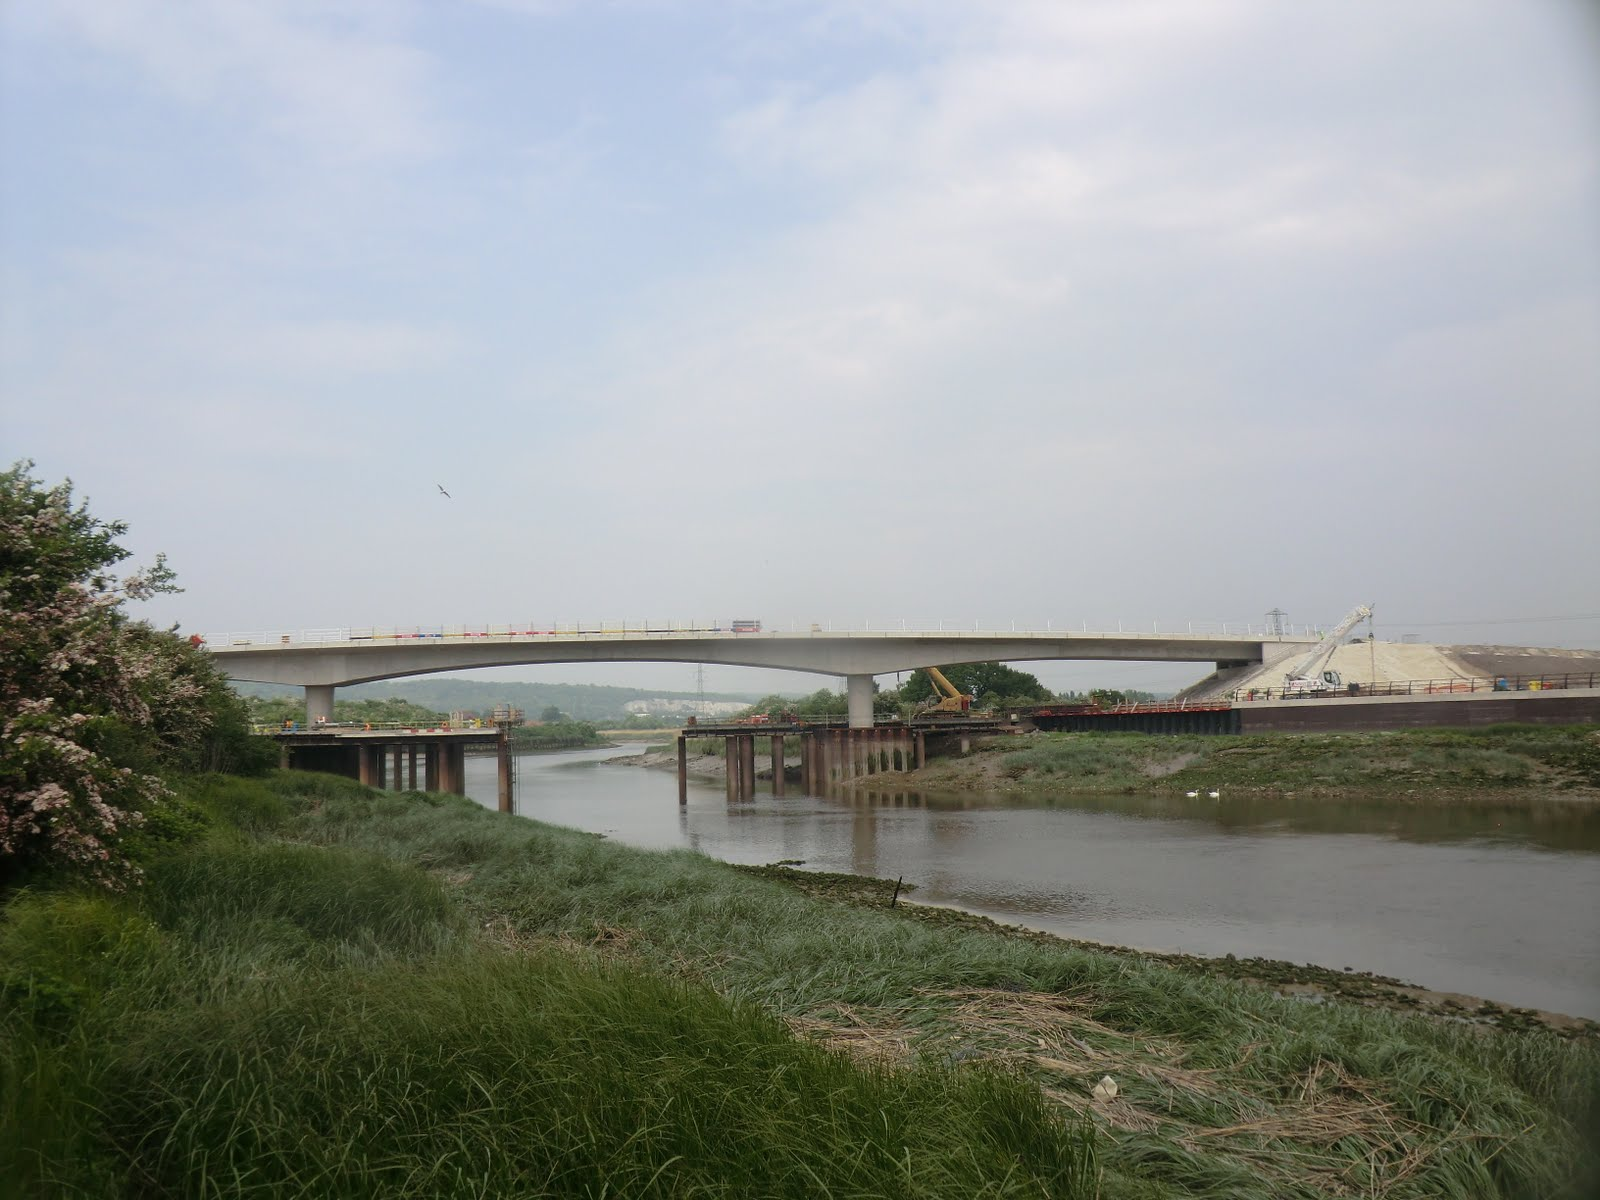 CIMG4438 New Medway Crossing at Holborough